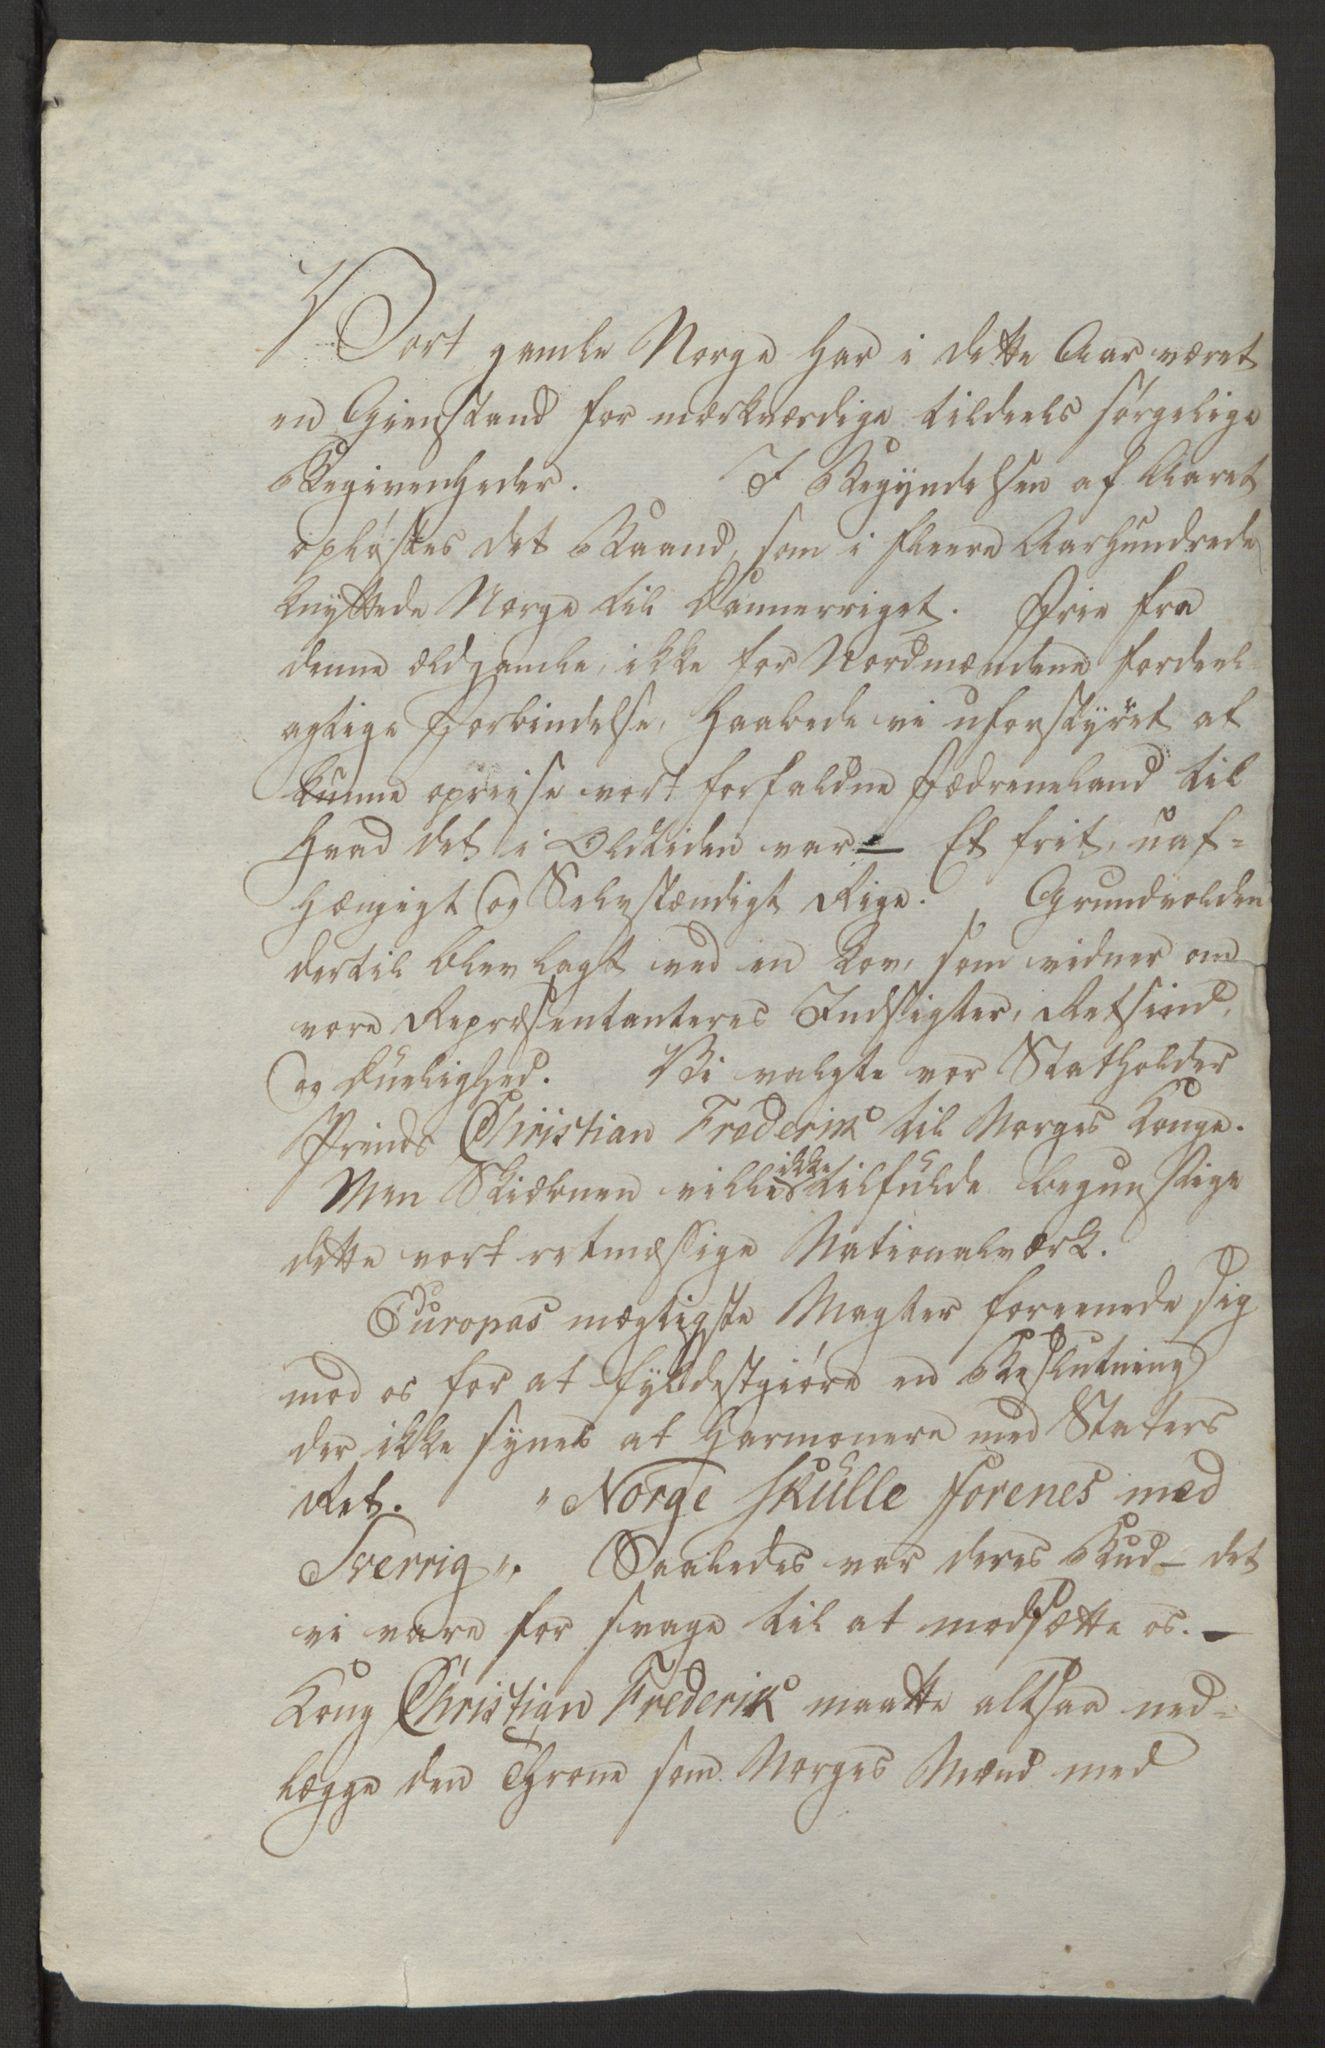 SAT, Nordland amt/fylke*, 1814, s. 3